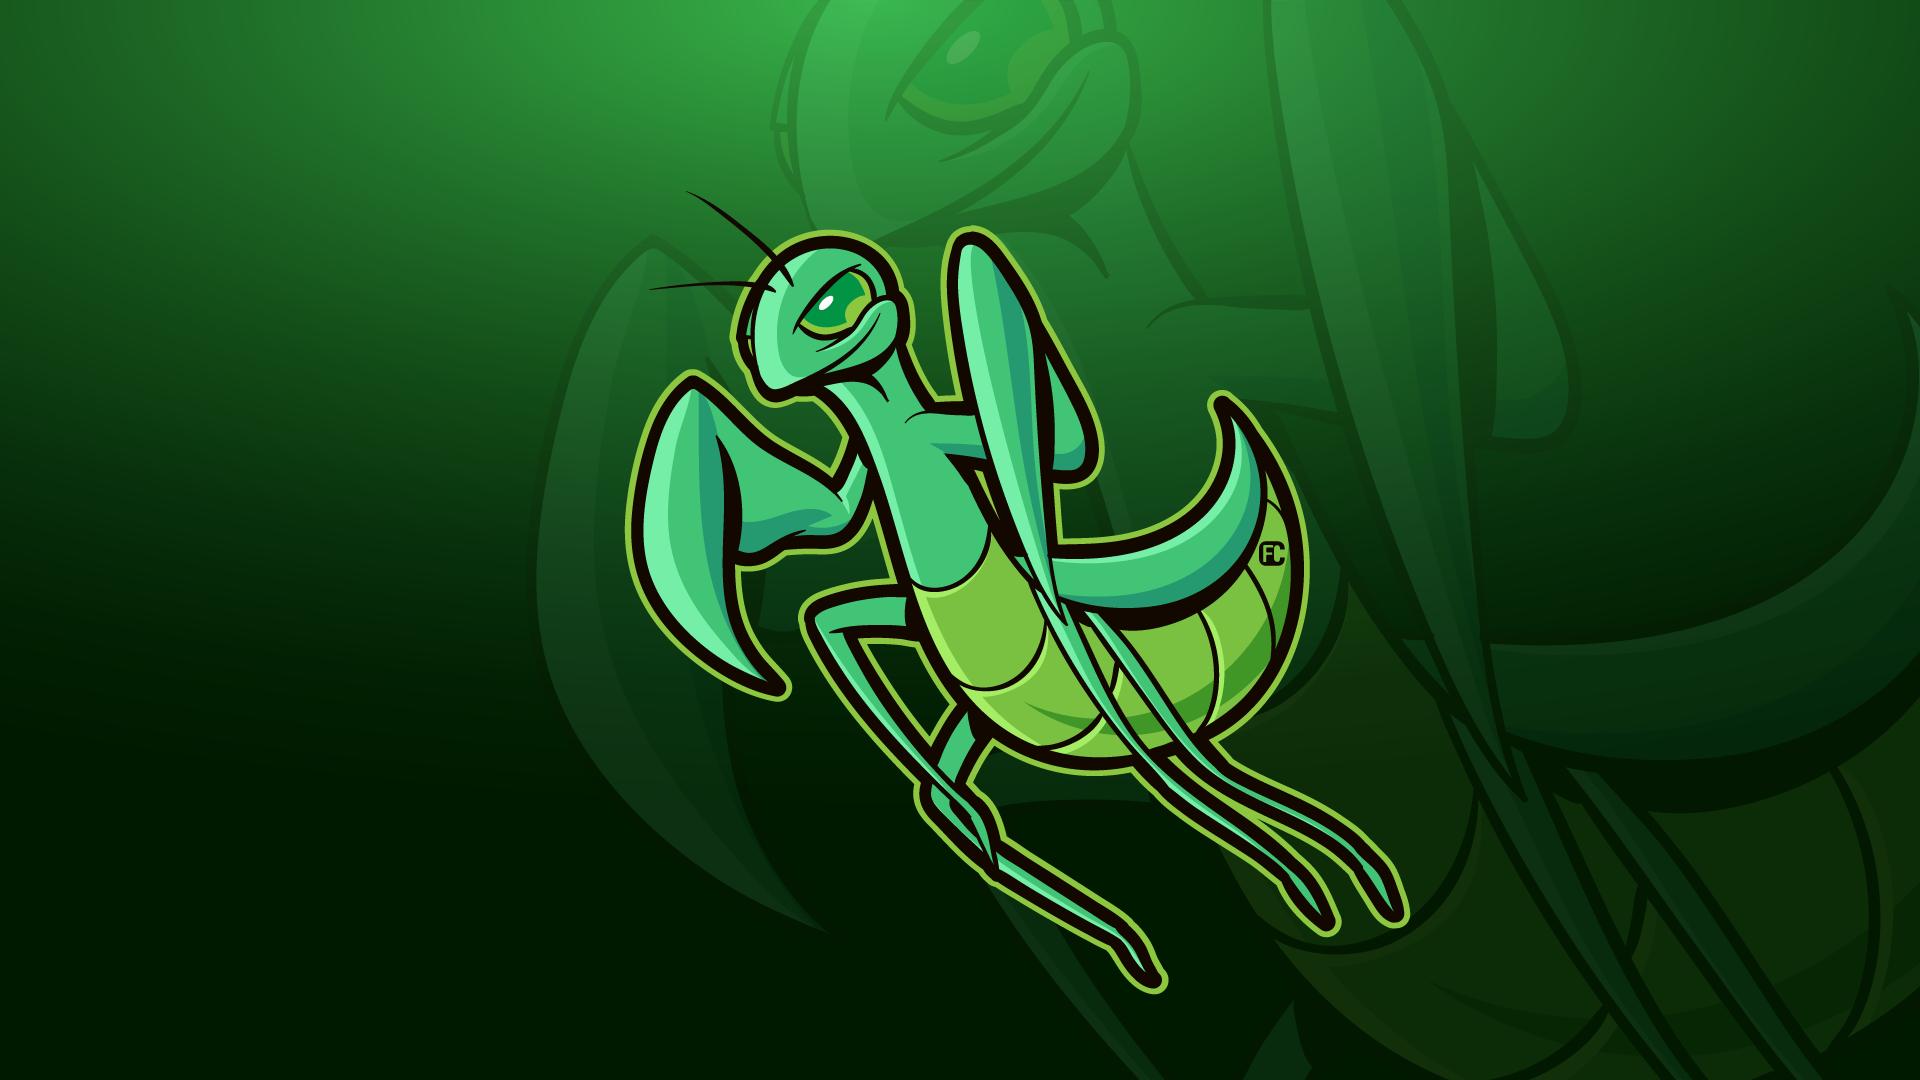 Praying-Mantis-Mascot-Logo-Fllcasts